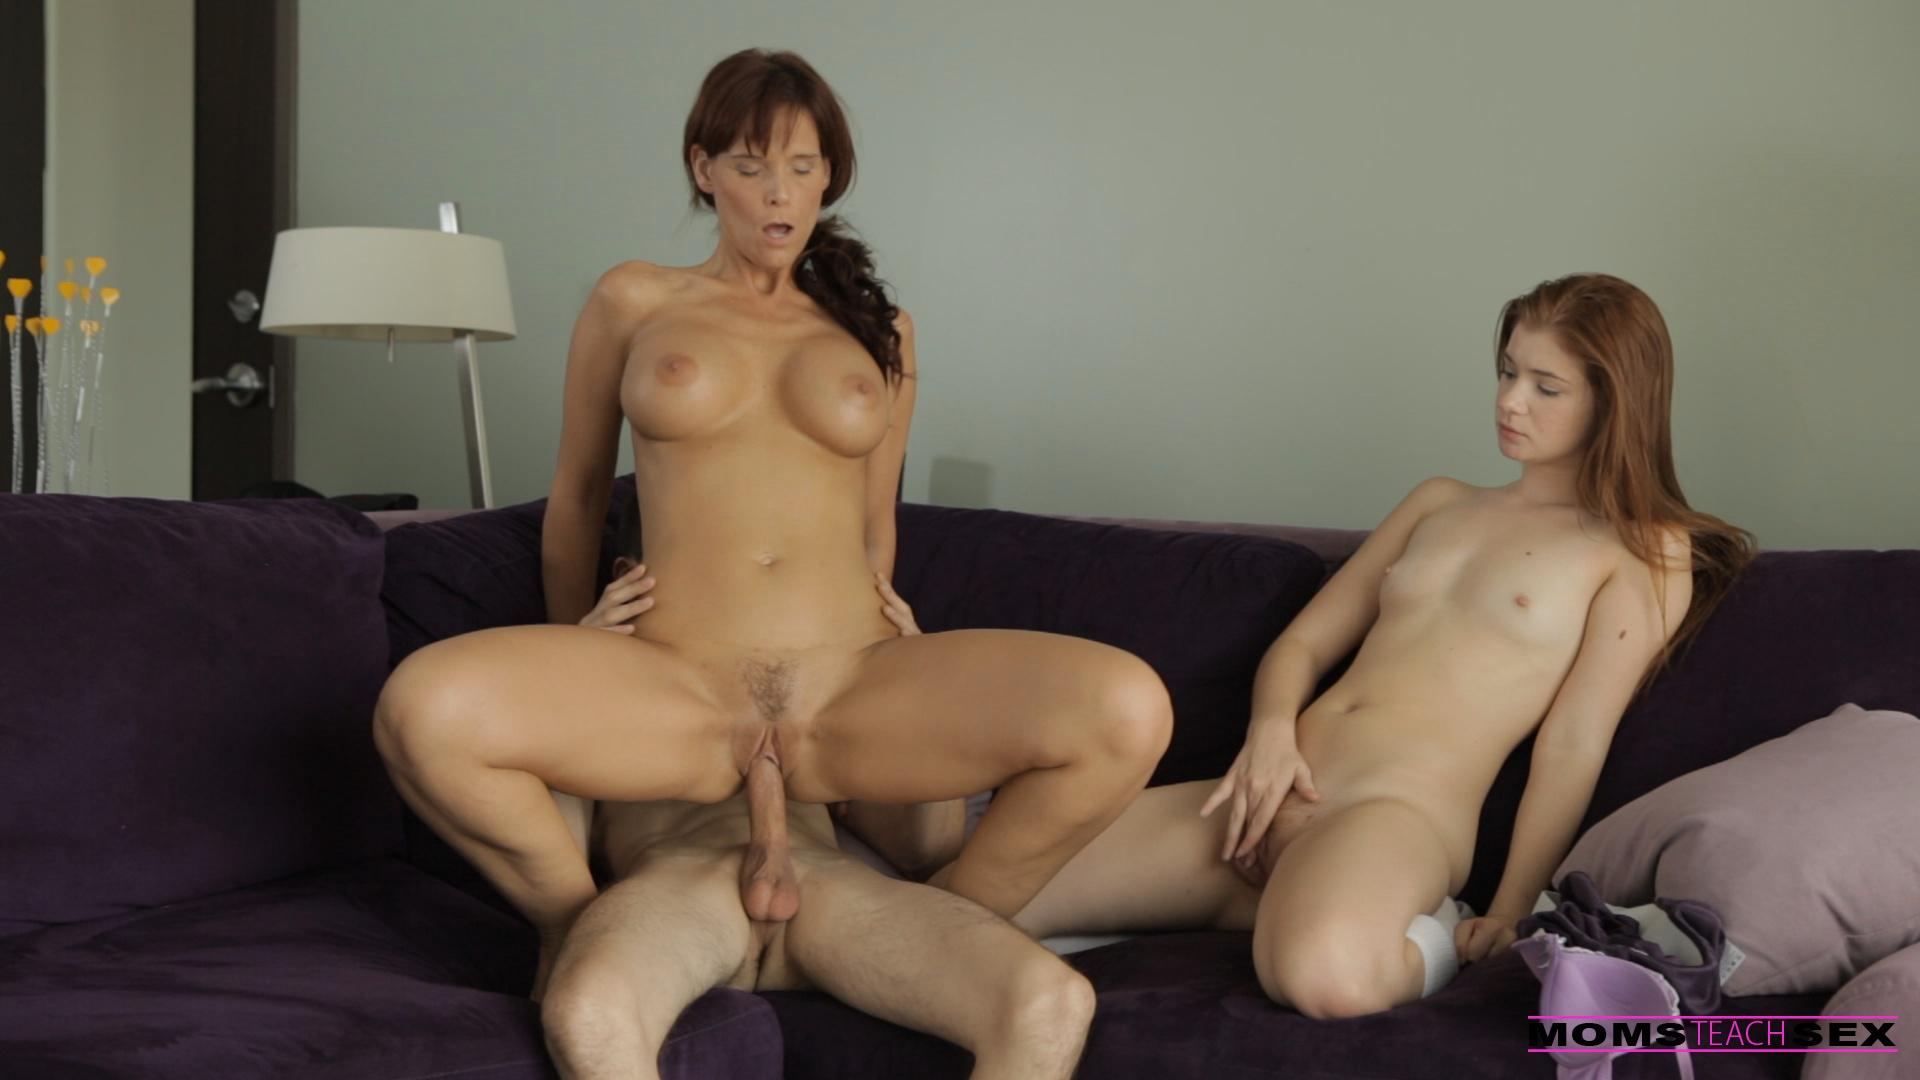 Instructional Sex Videos